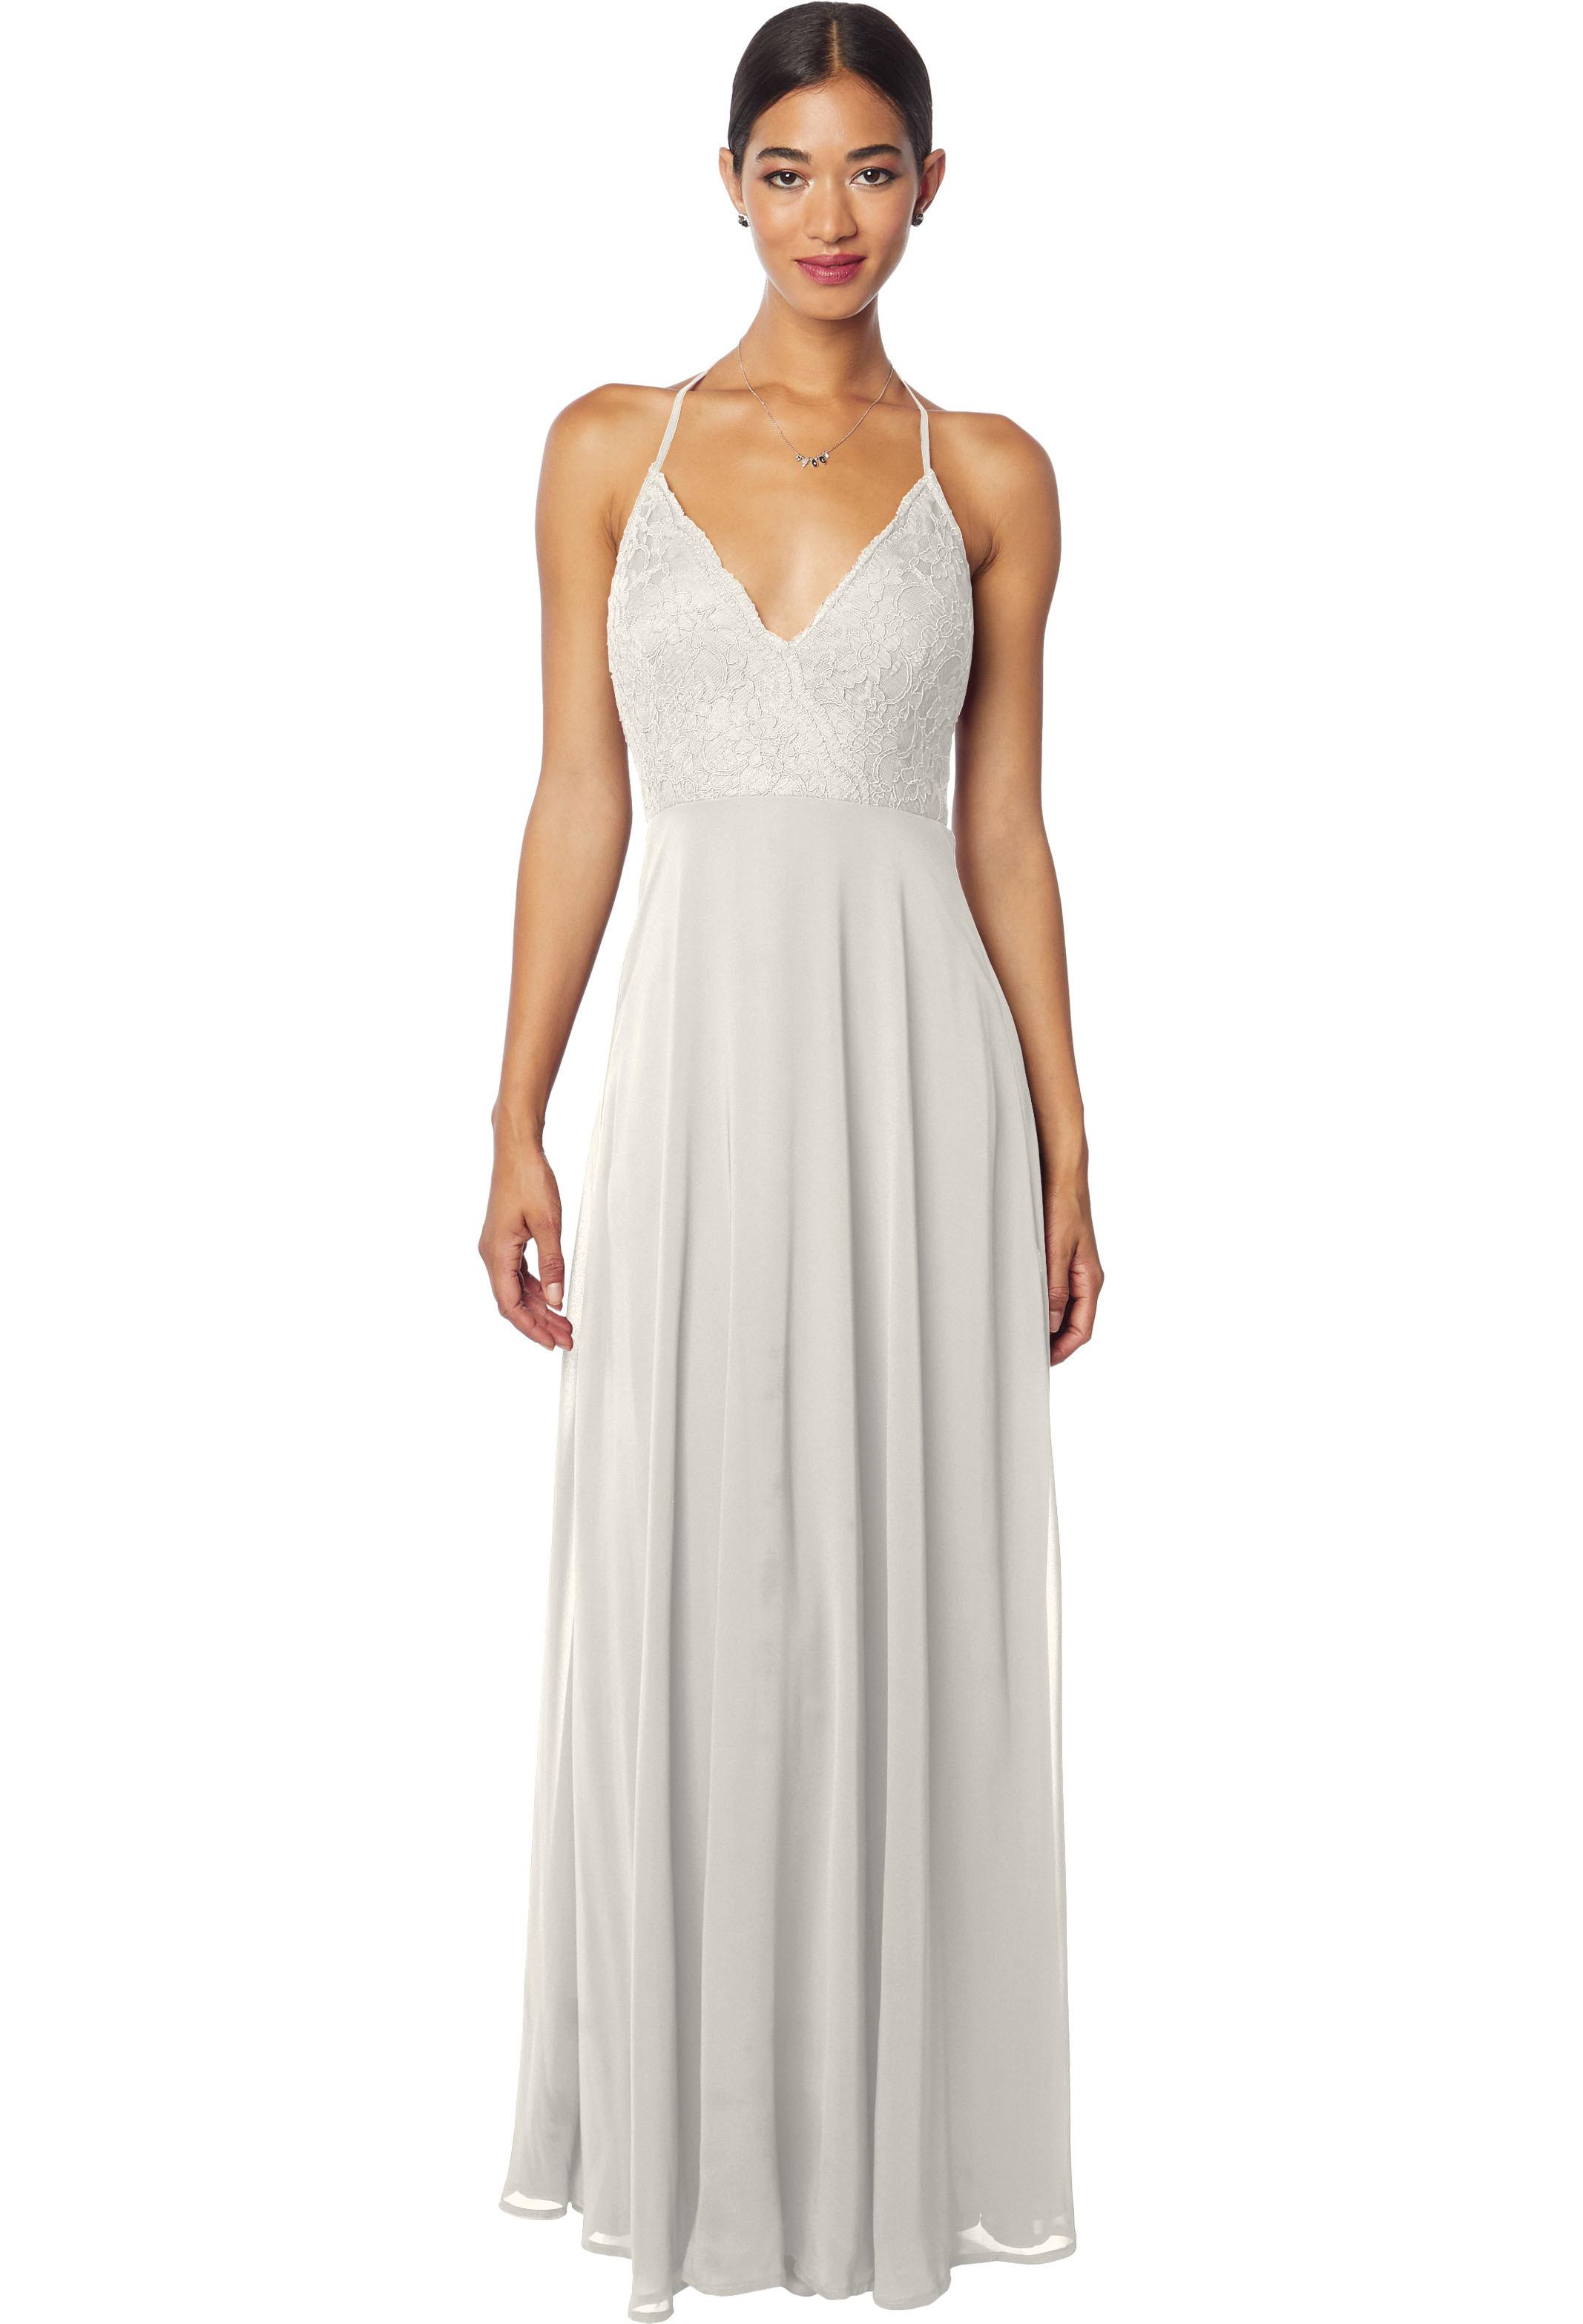 Bill Levkoff DESERT GREY Chiffon V-neck A-line gown, $220.00 Front